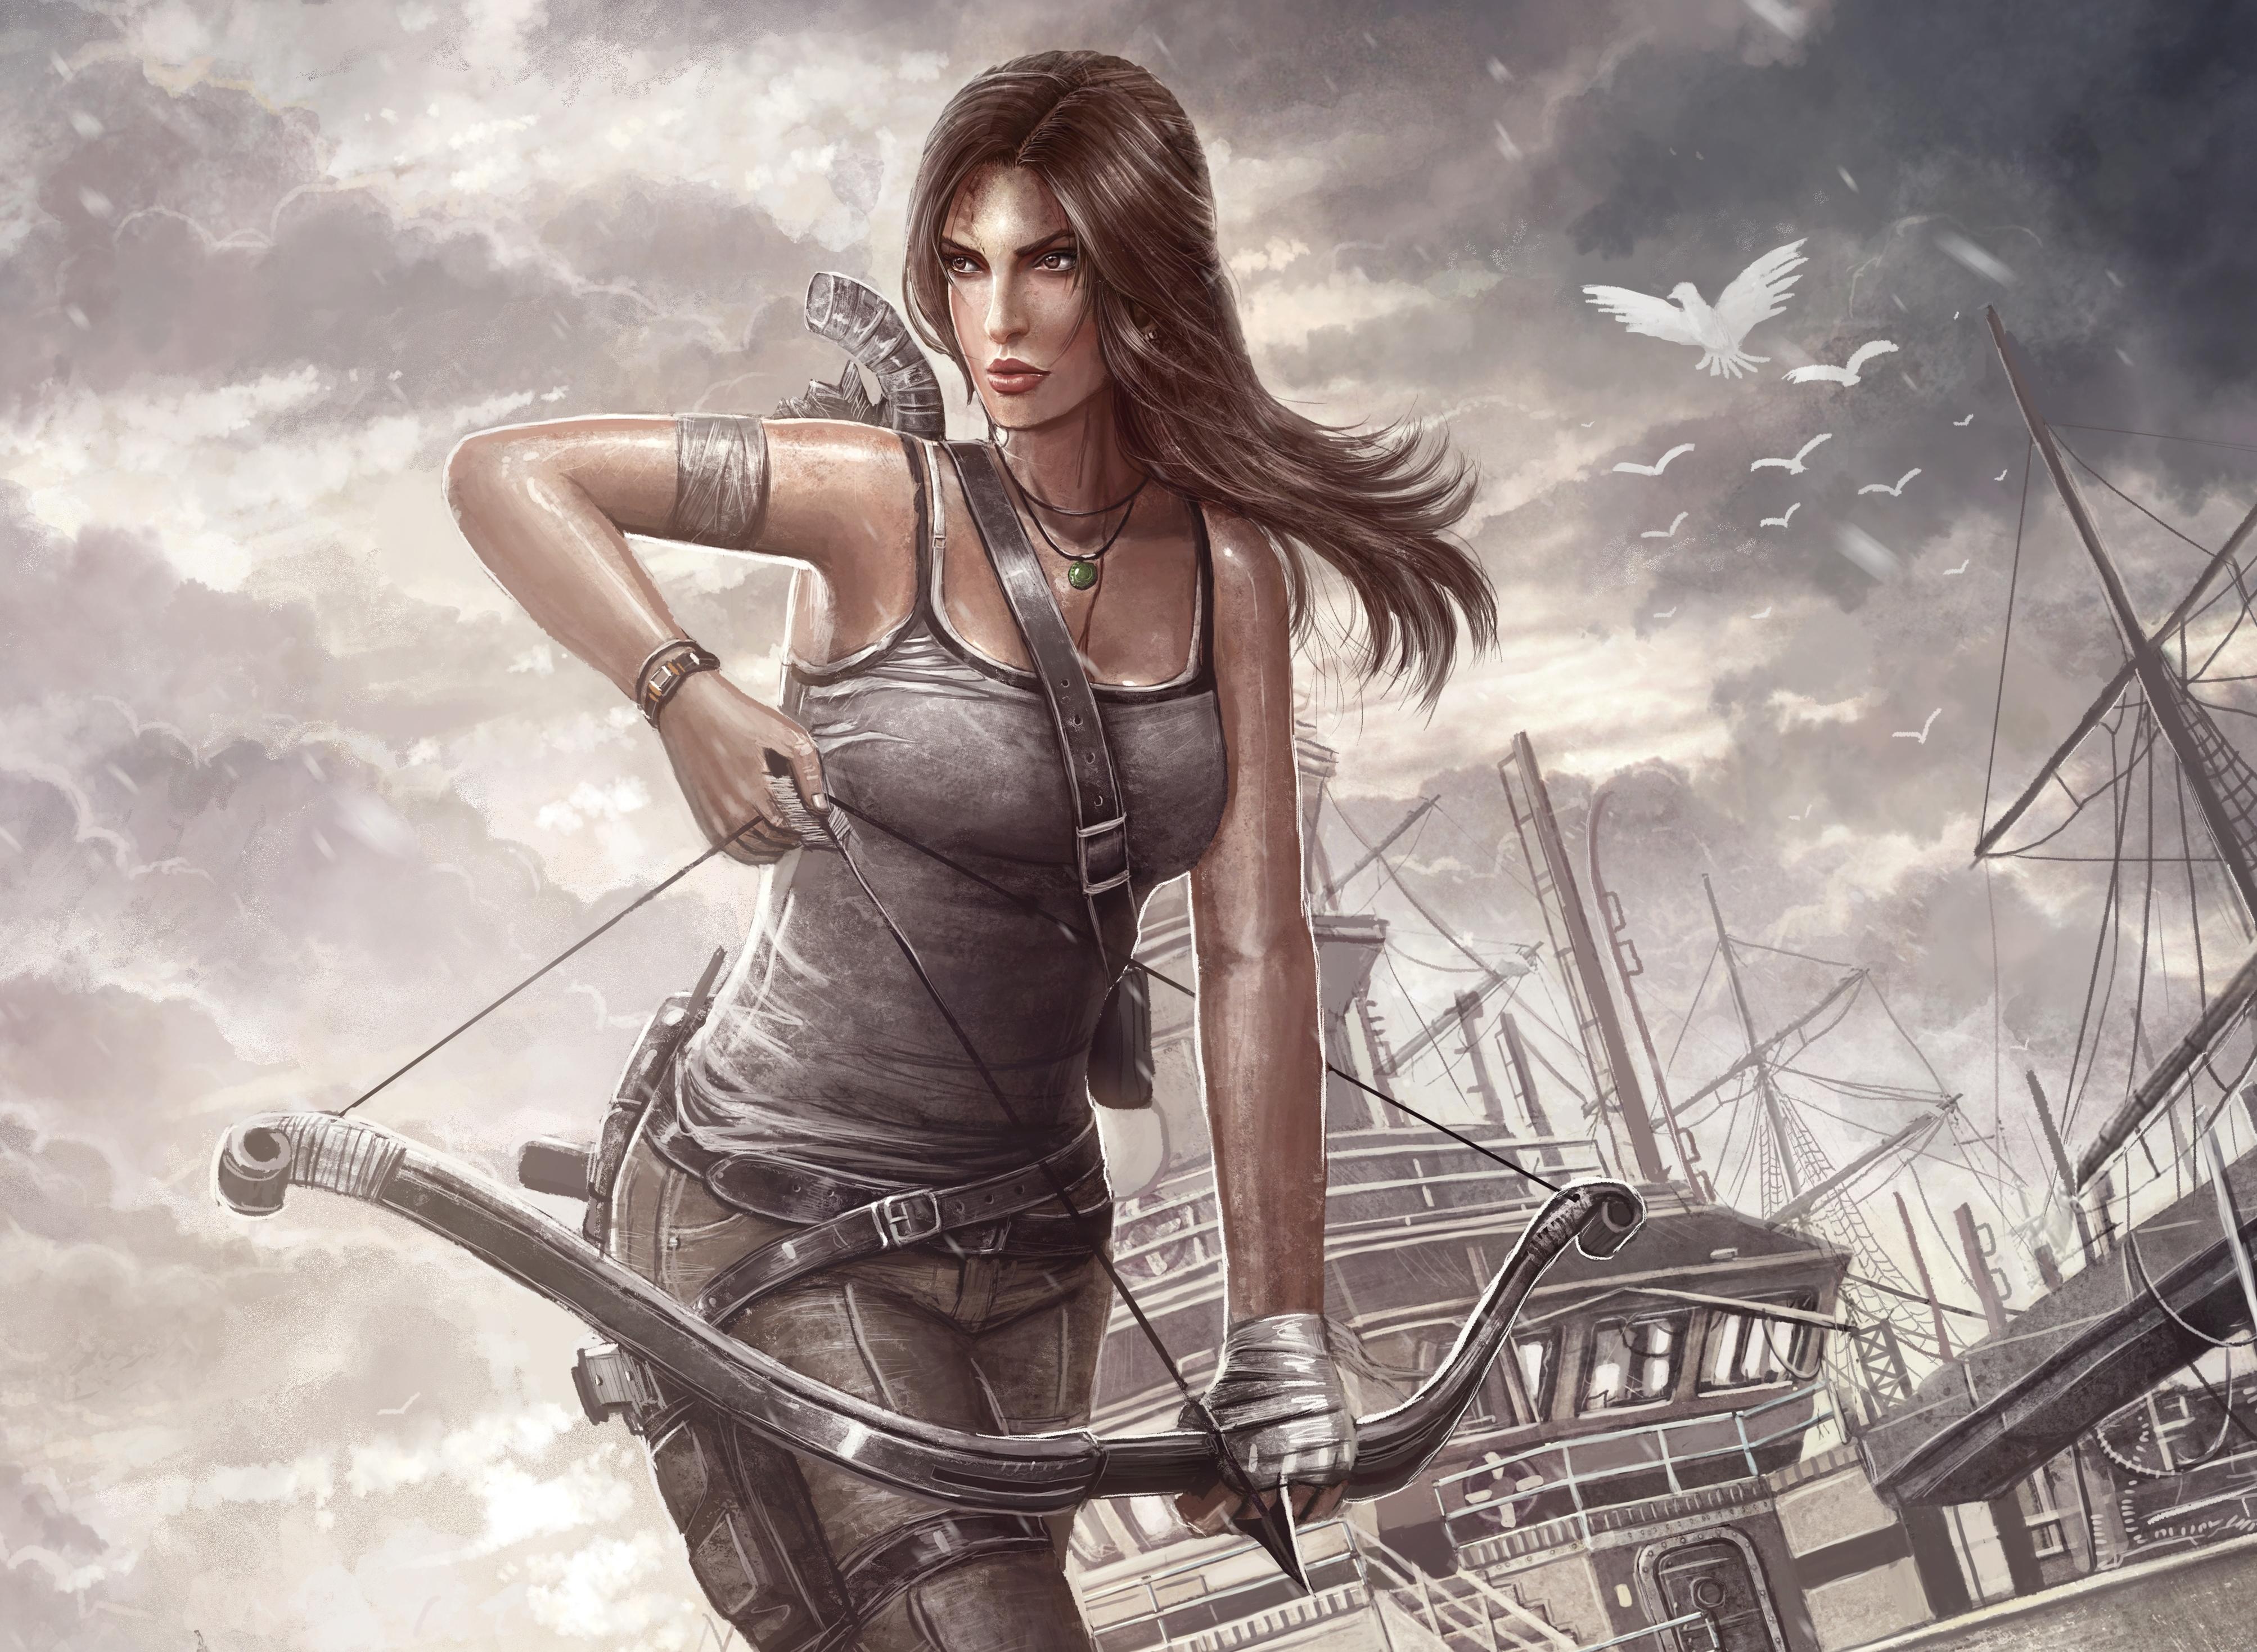 7680x4320 Lara Croft 8k Artwork 8k Hd 4k Wallpapers: Tomb Raider, Lara Croft, Reborn, HD 4K Wallpaper